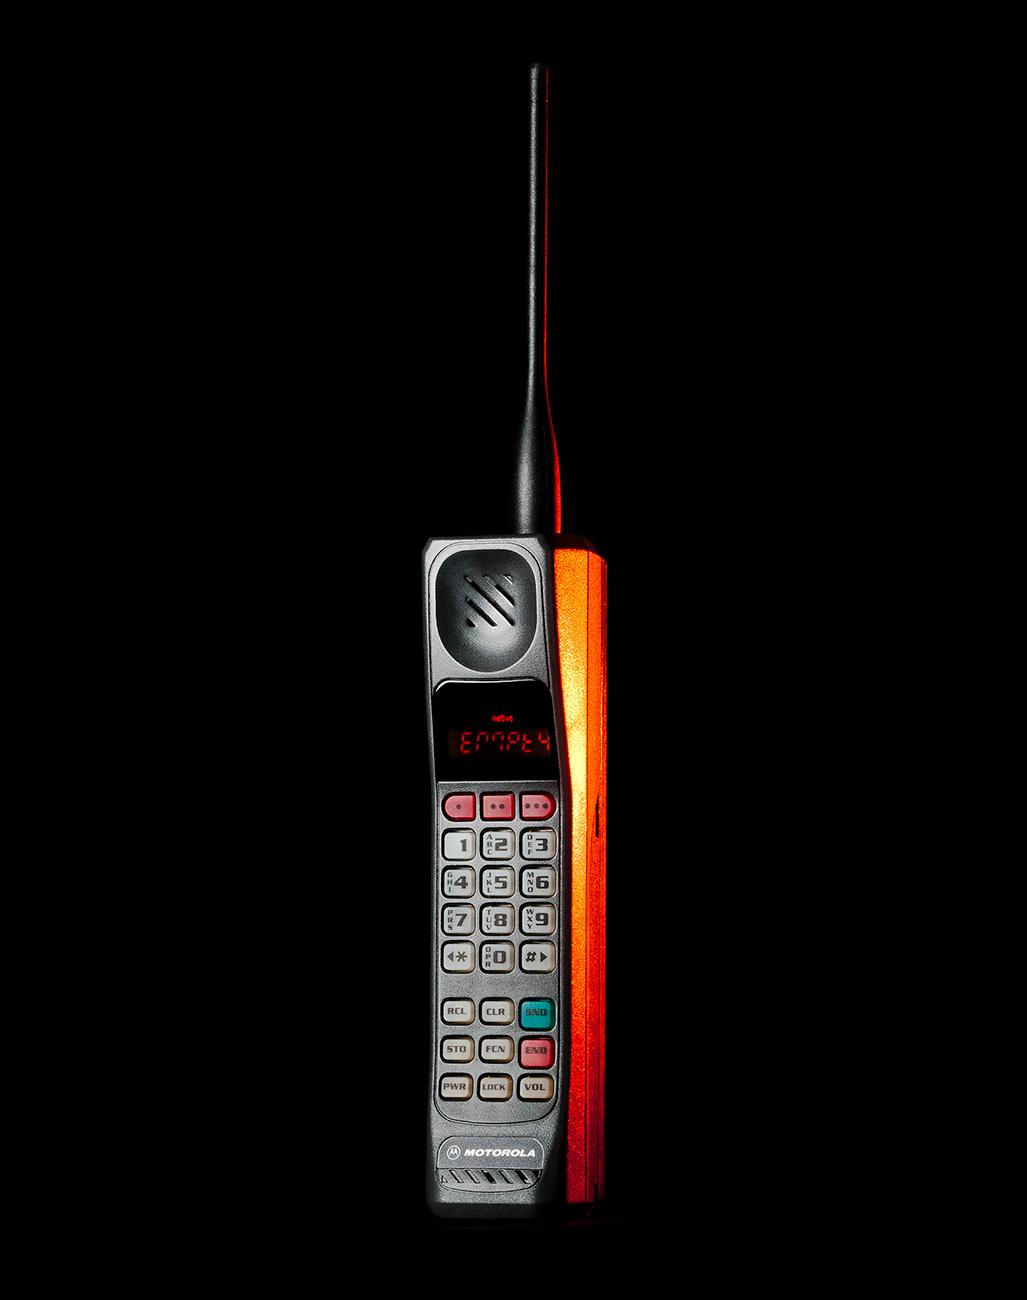 Motorola Cellular Phone © Shawn Collie Photography